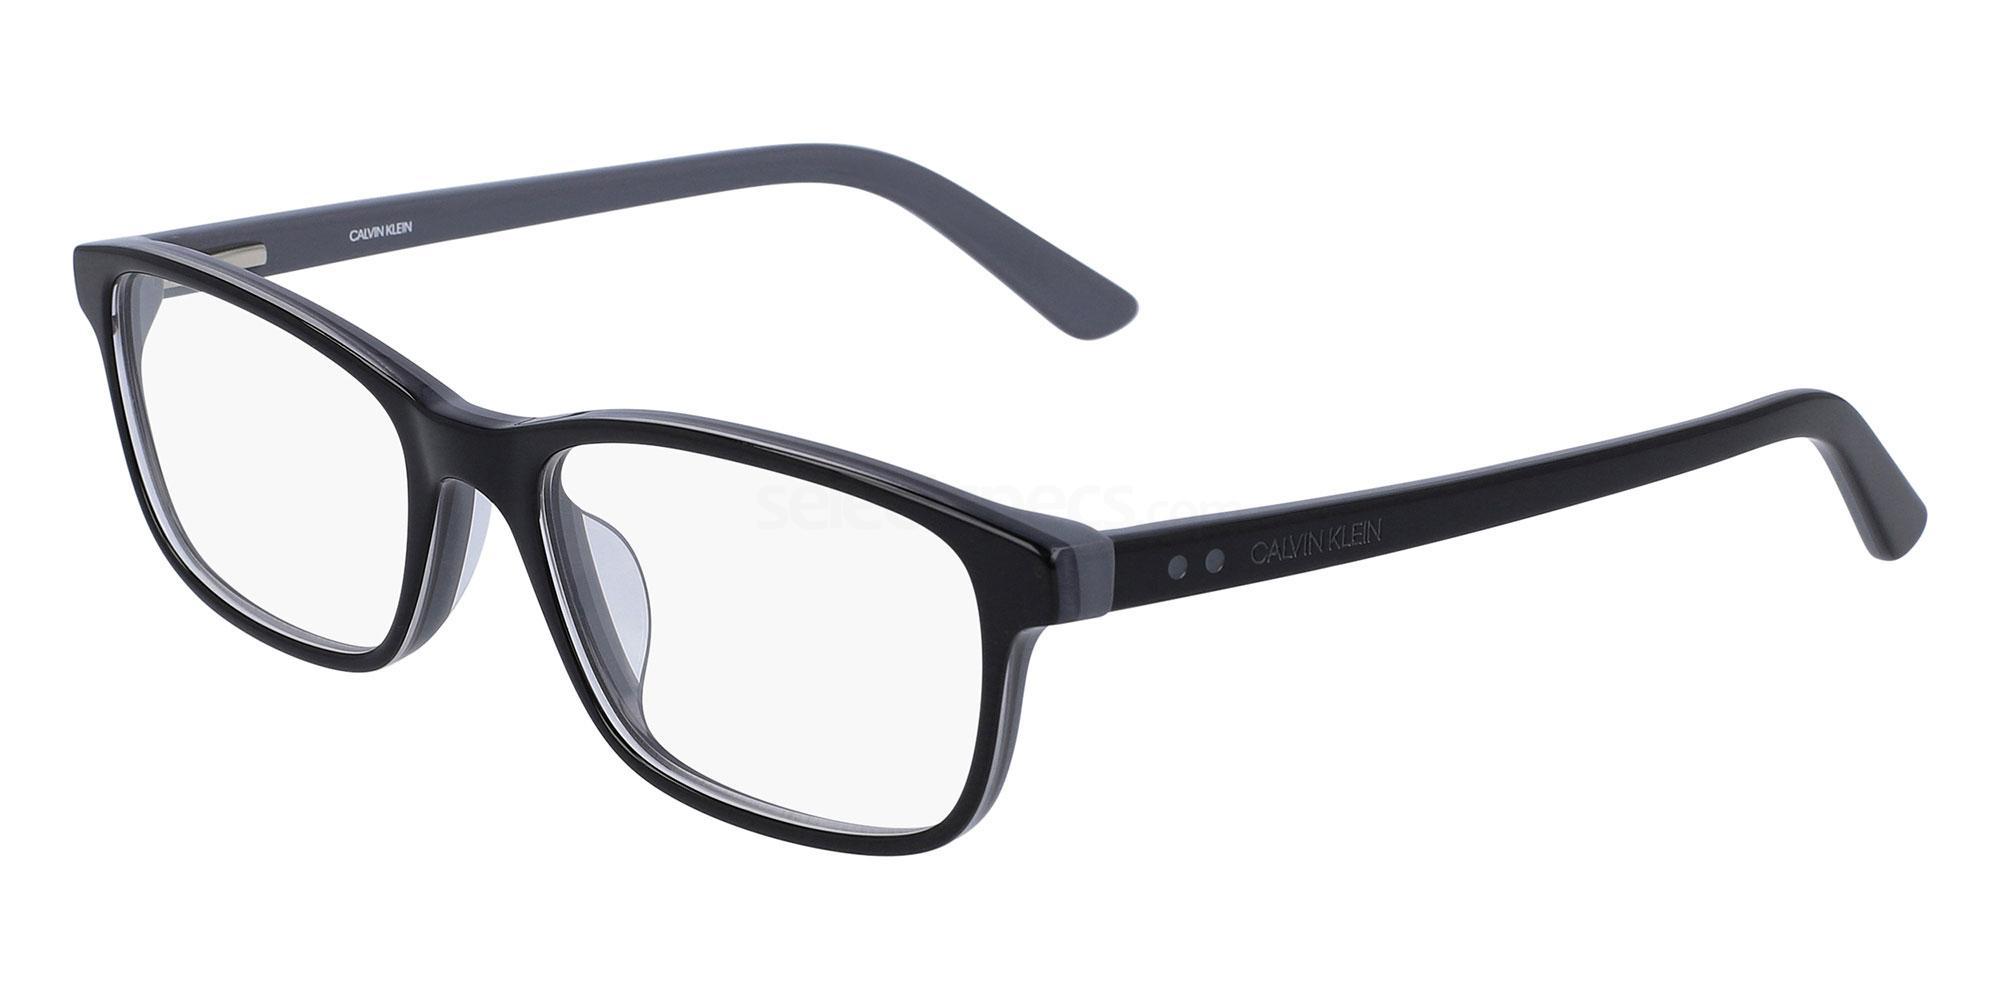 032 CK19507 Glasses, Calvin Klein